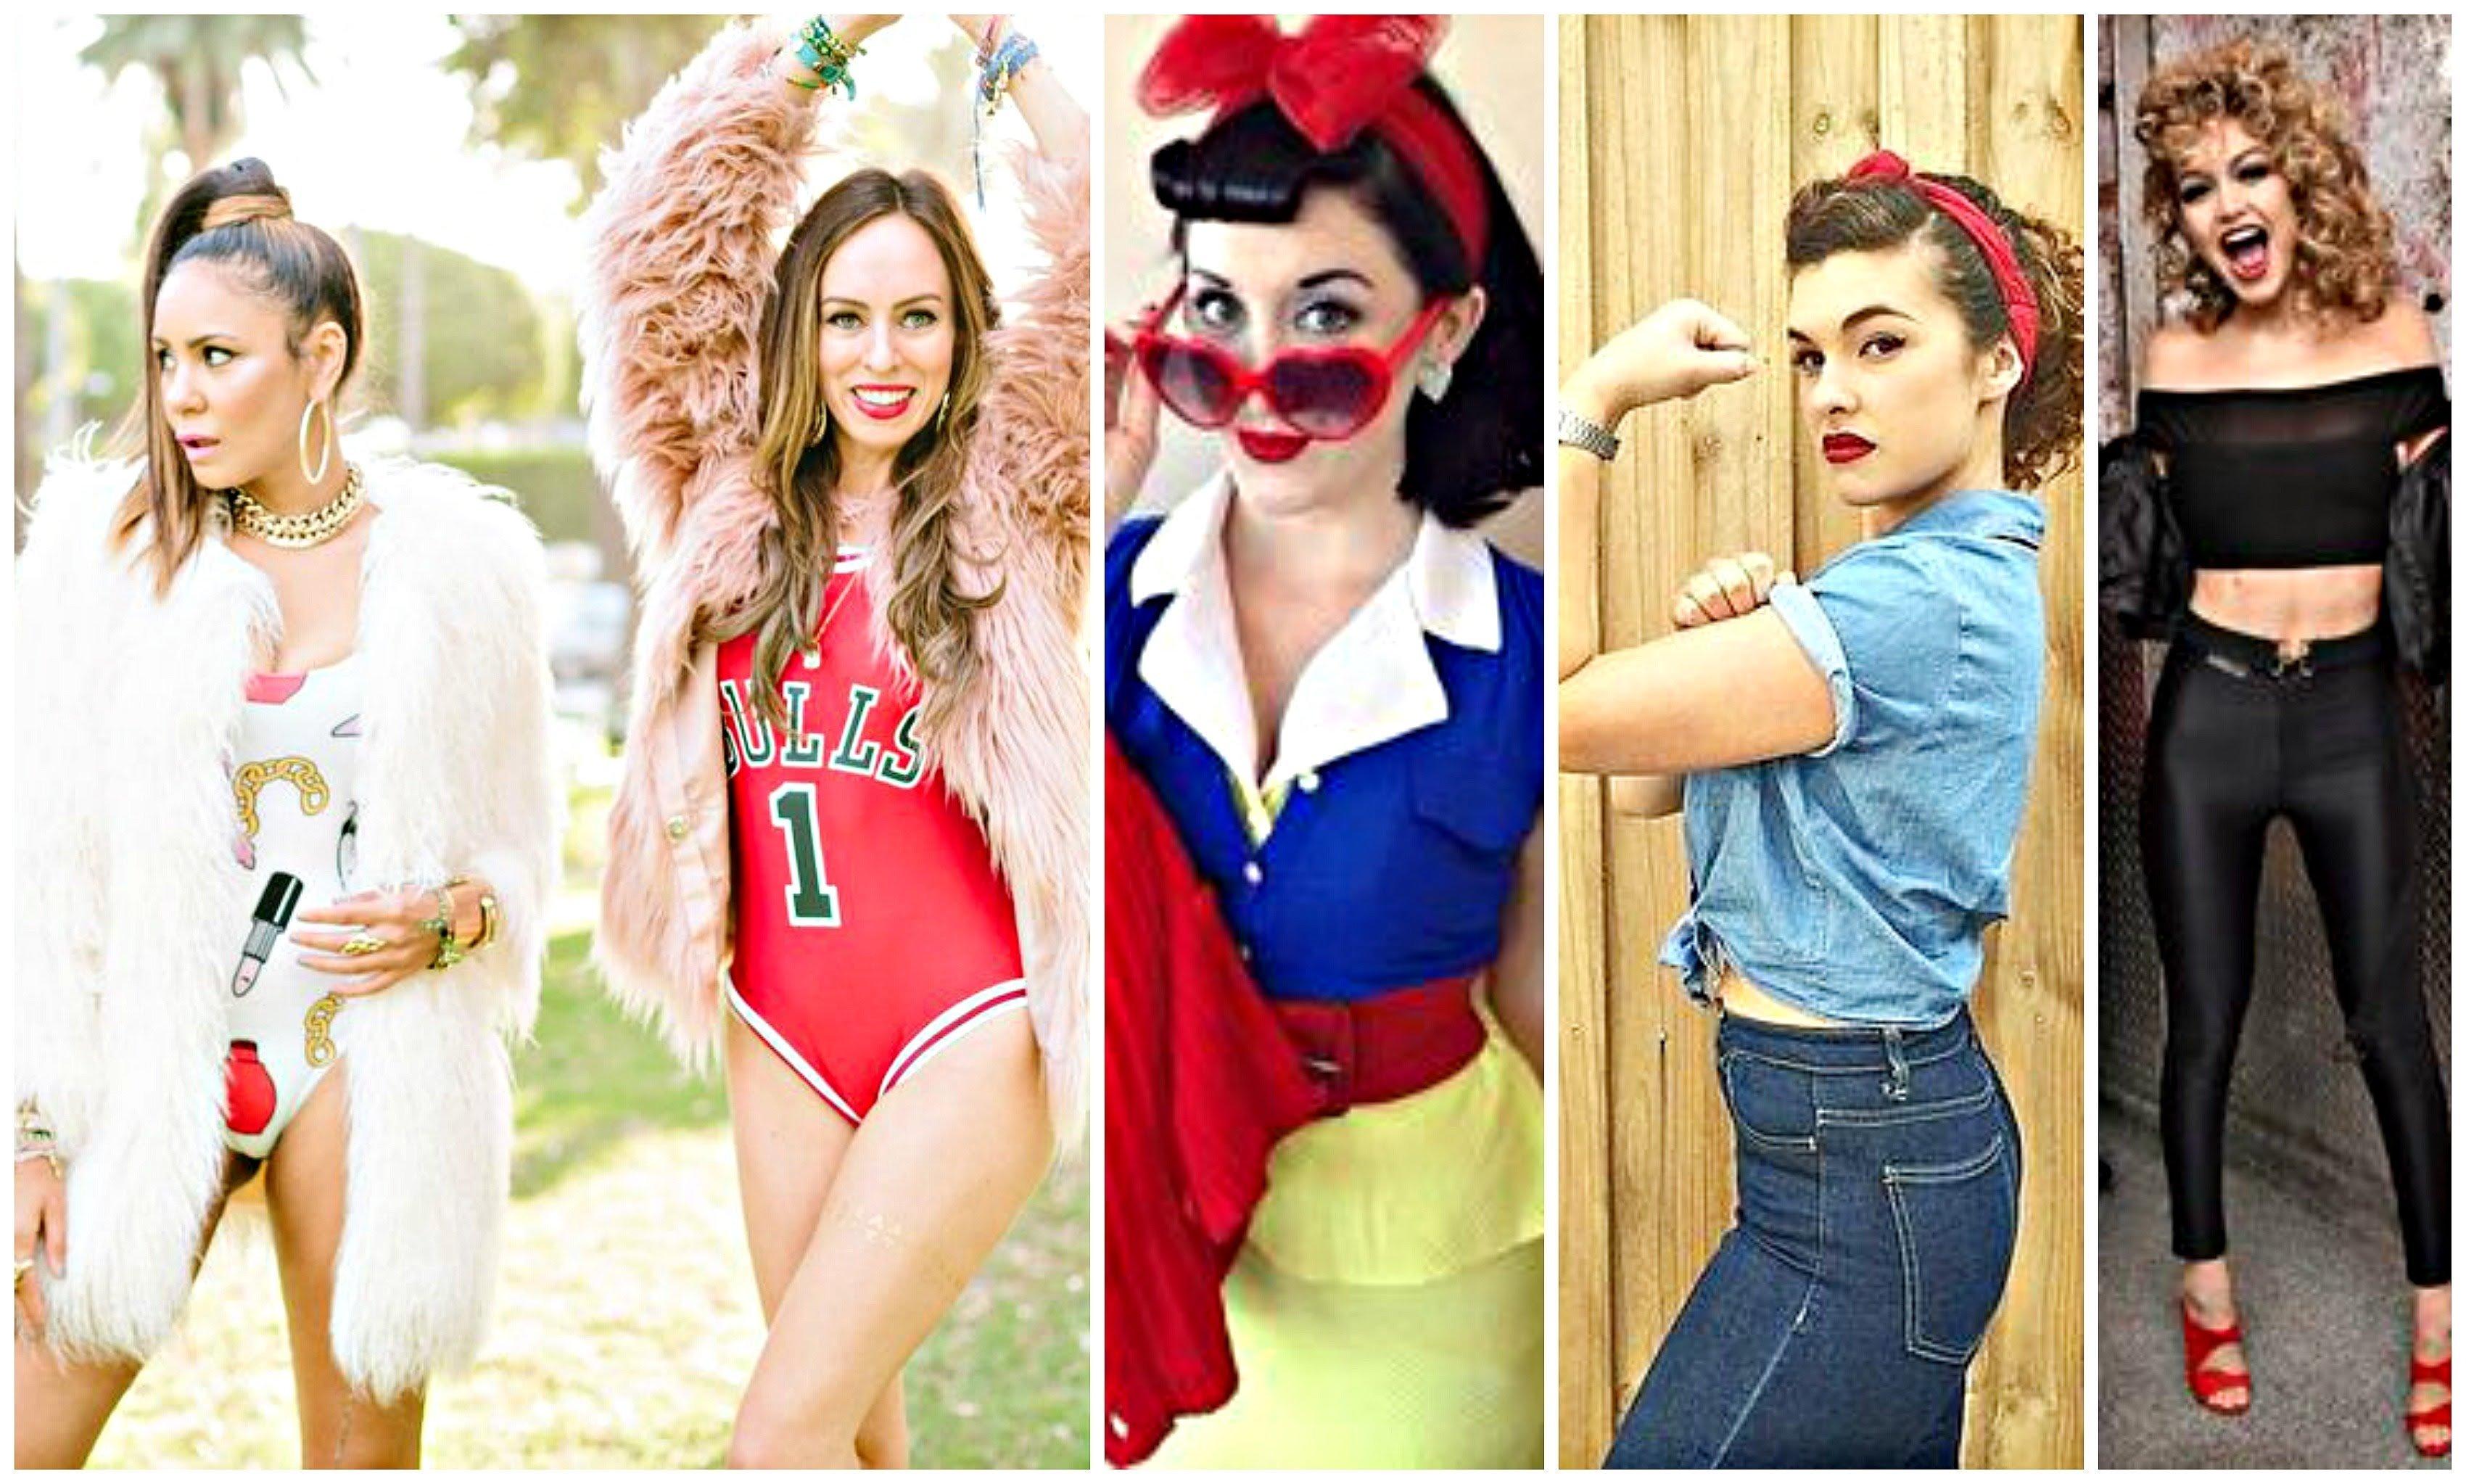 10 Stunning Halloween Costumes For Women Ideas top halloween costume ideas for women youtube 13 2020